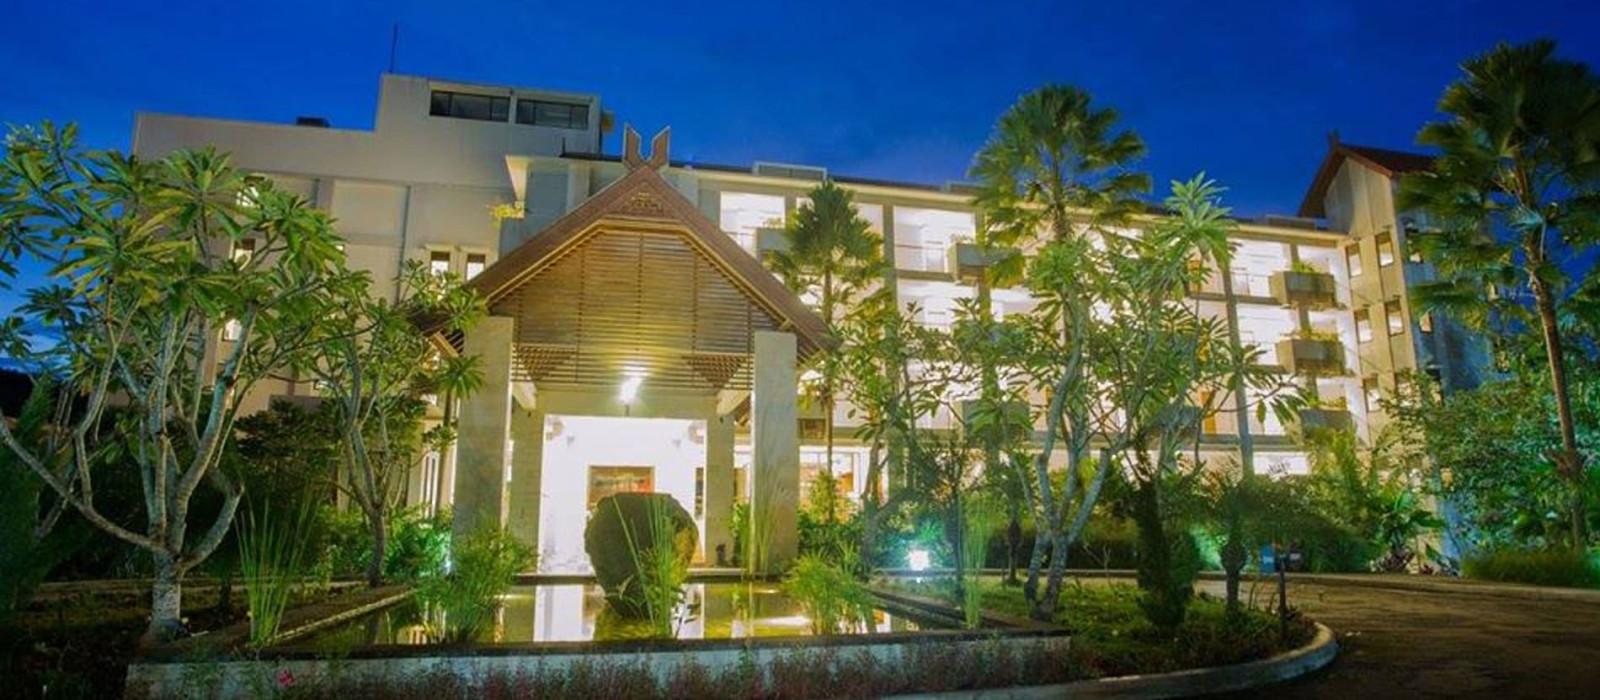 Hotel Bintang Flores   Indonesien